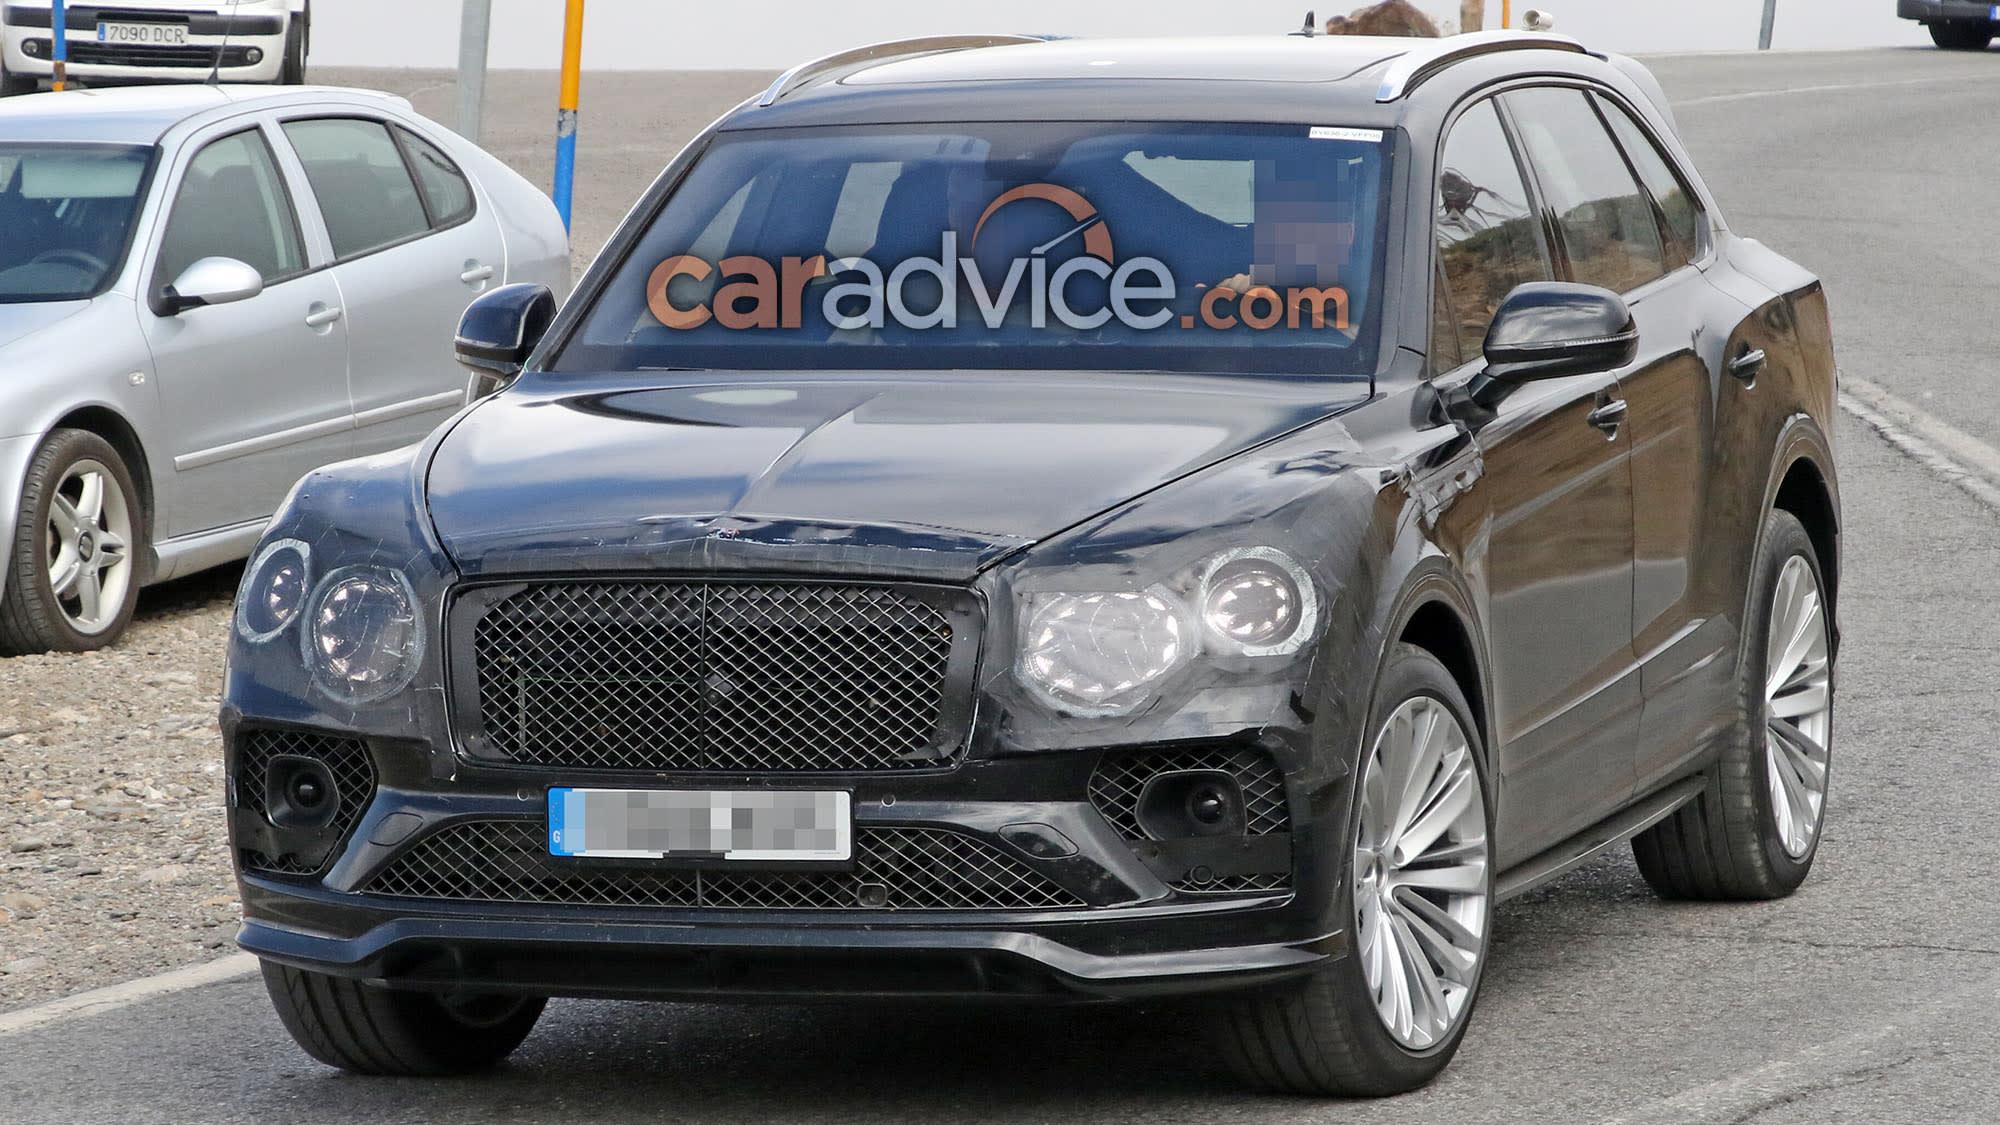 2020 Bentley Bentayga Facelift Spied Caradvice